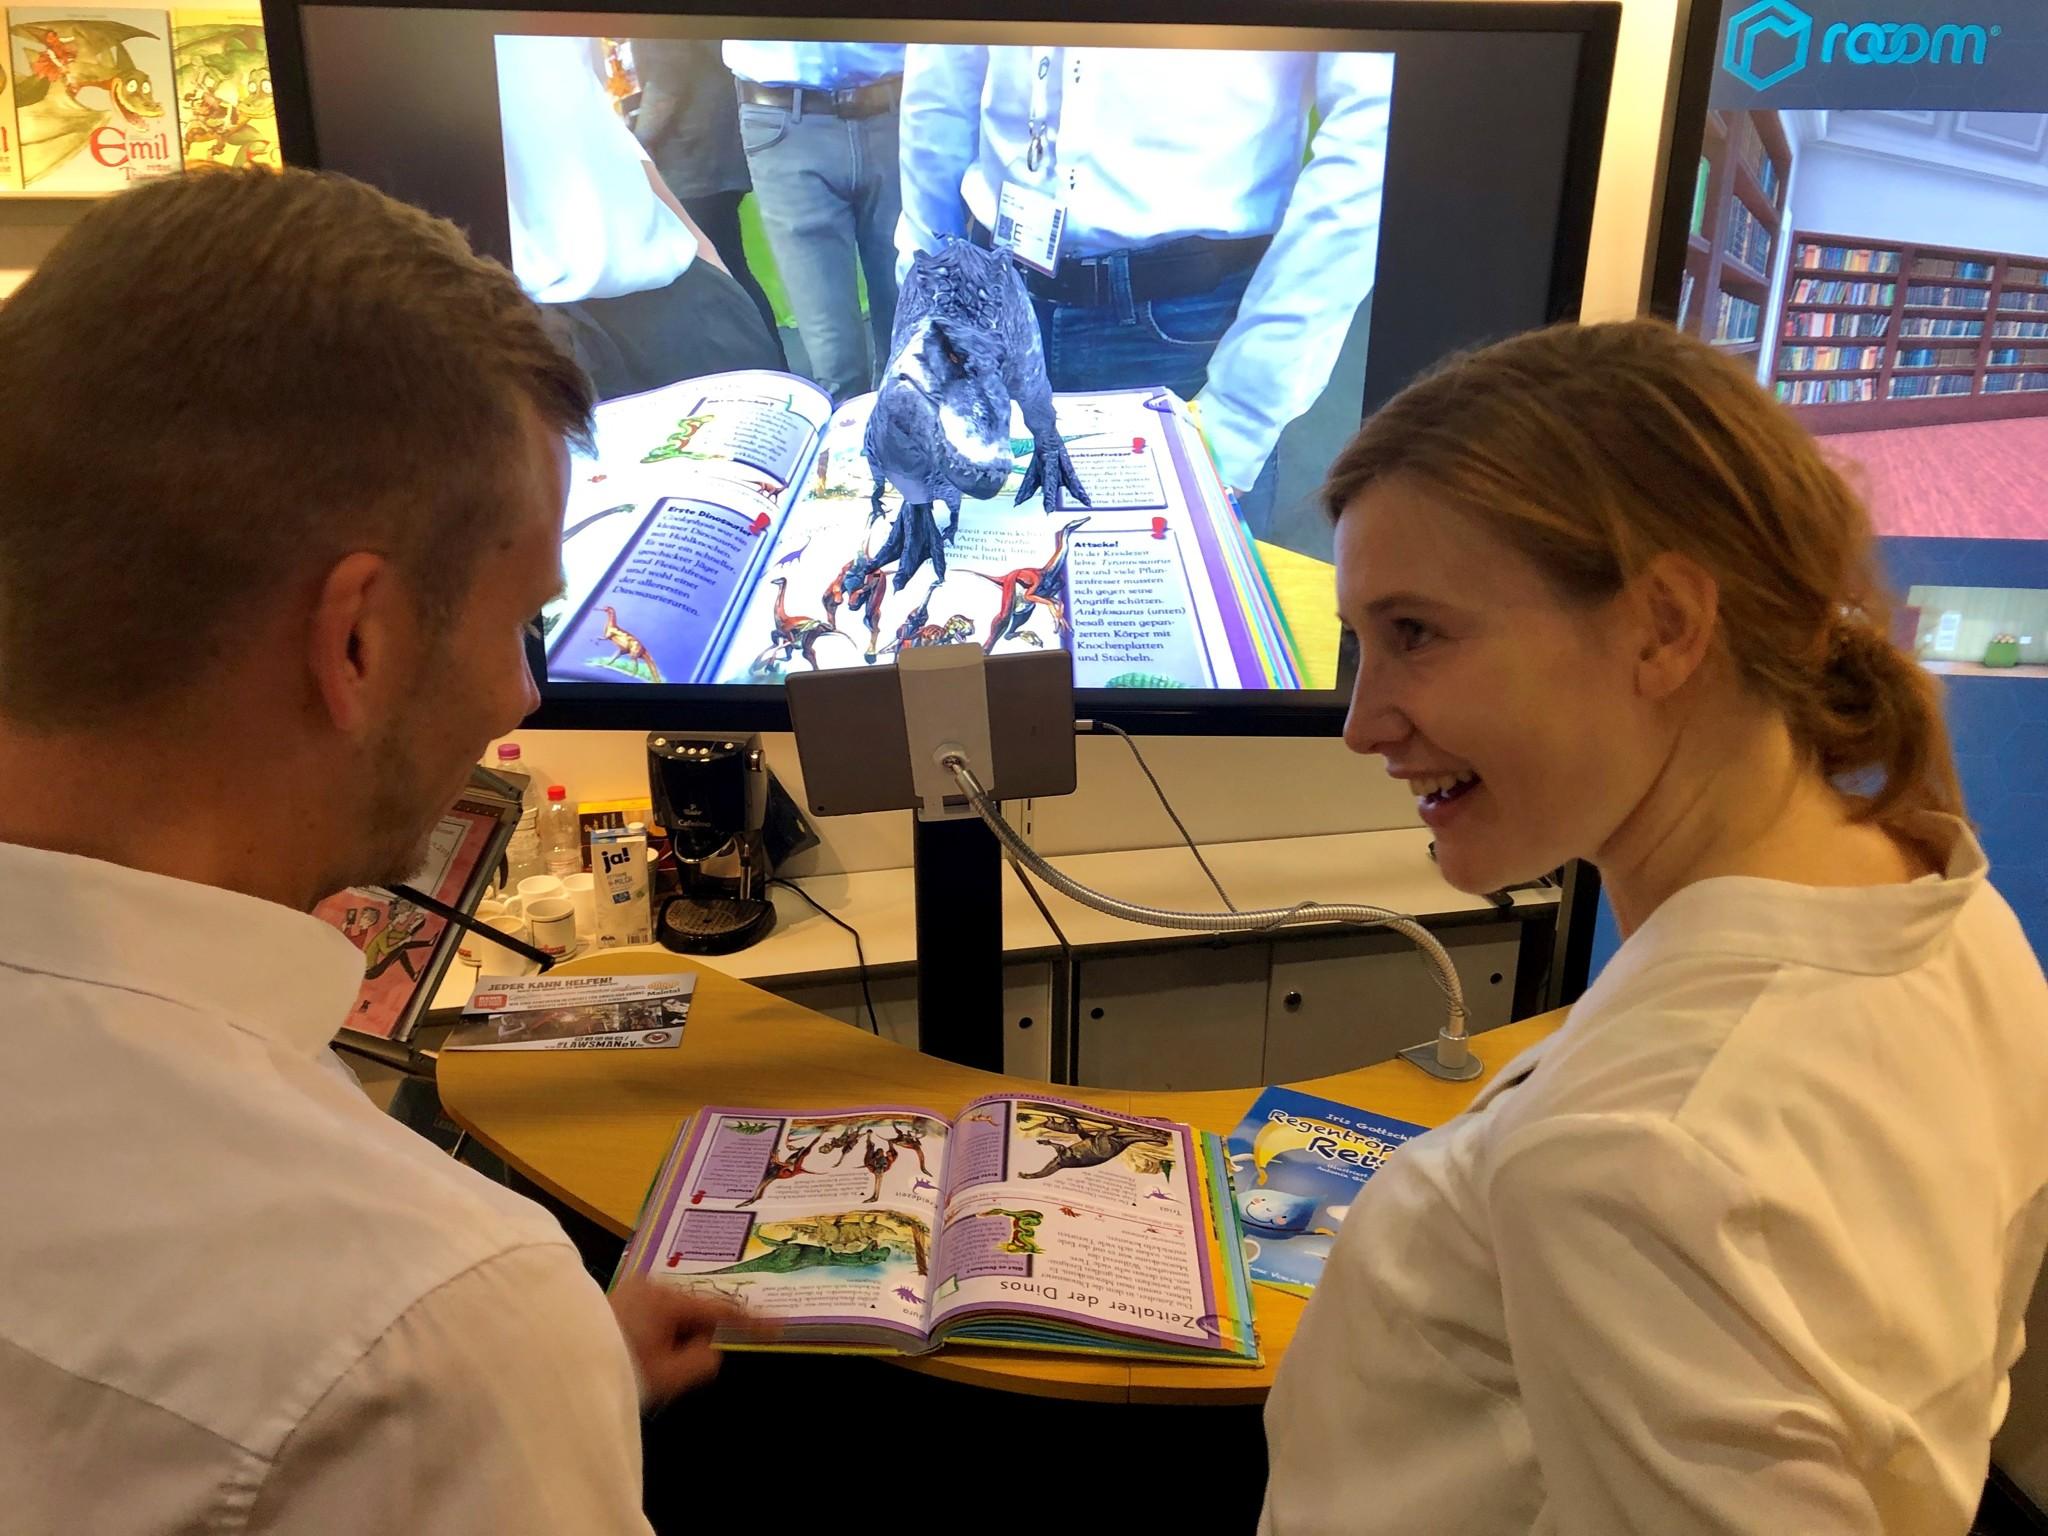 rooom presents 3D content for children's books at Frankfurter Buchmesse 2019